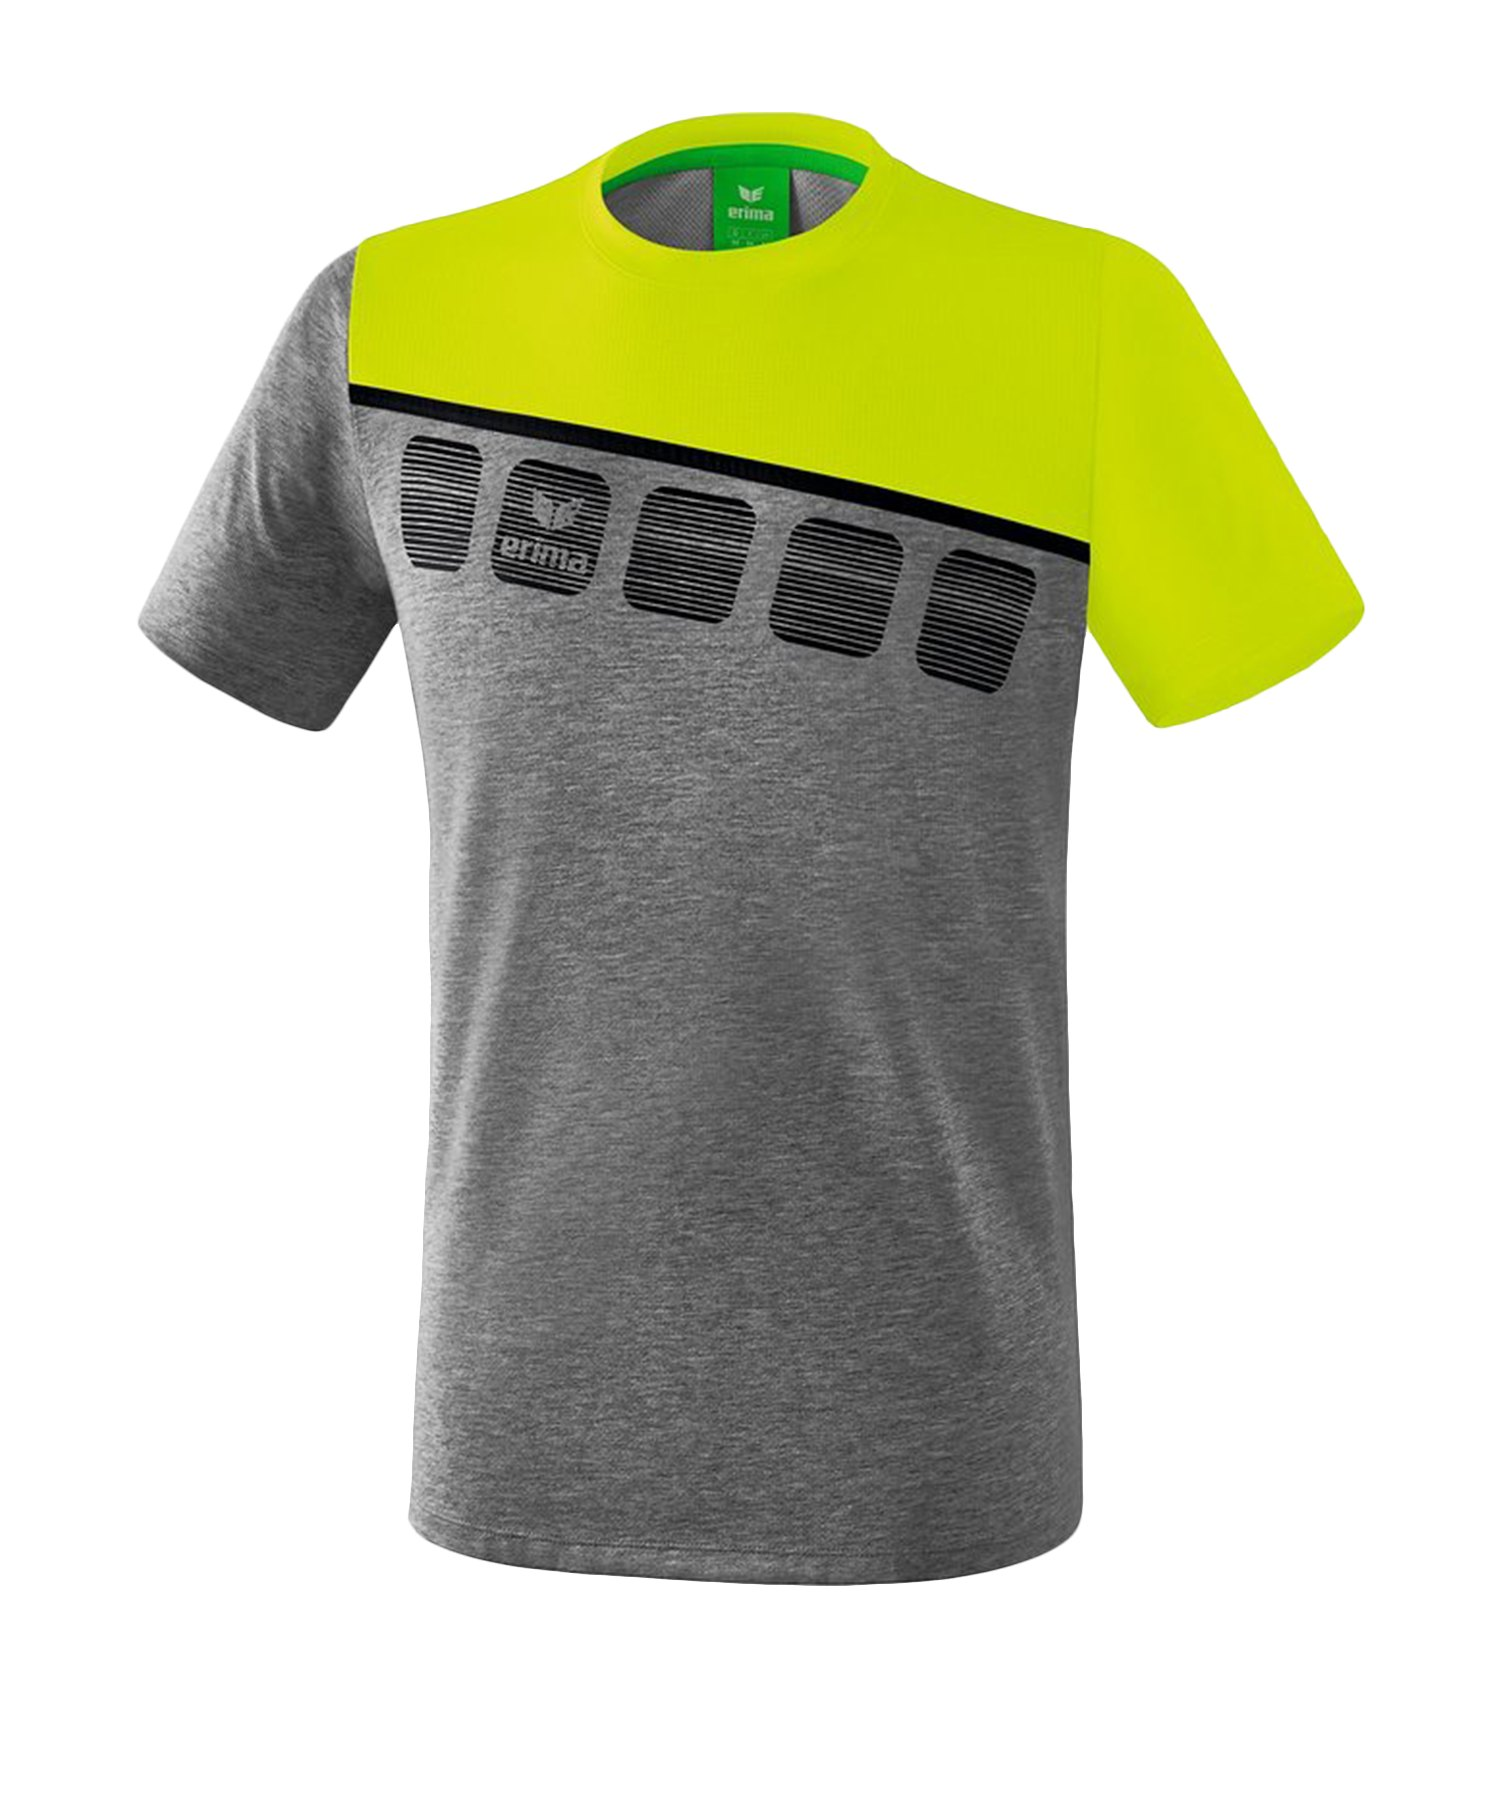 Erima 5-C T-Shirt Kids Grau Grün - Grau